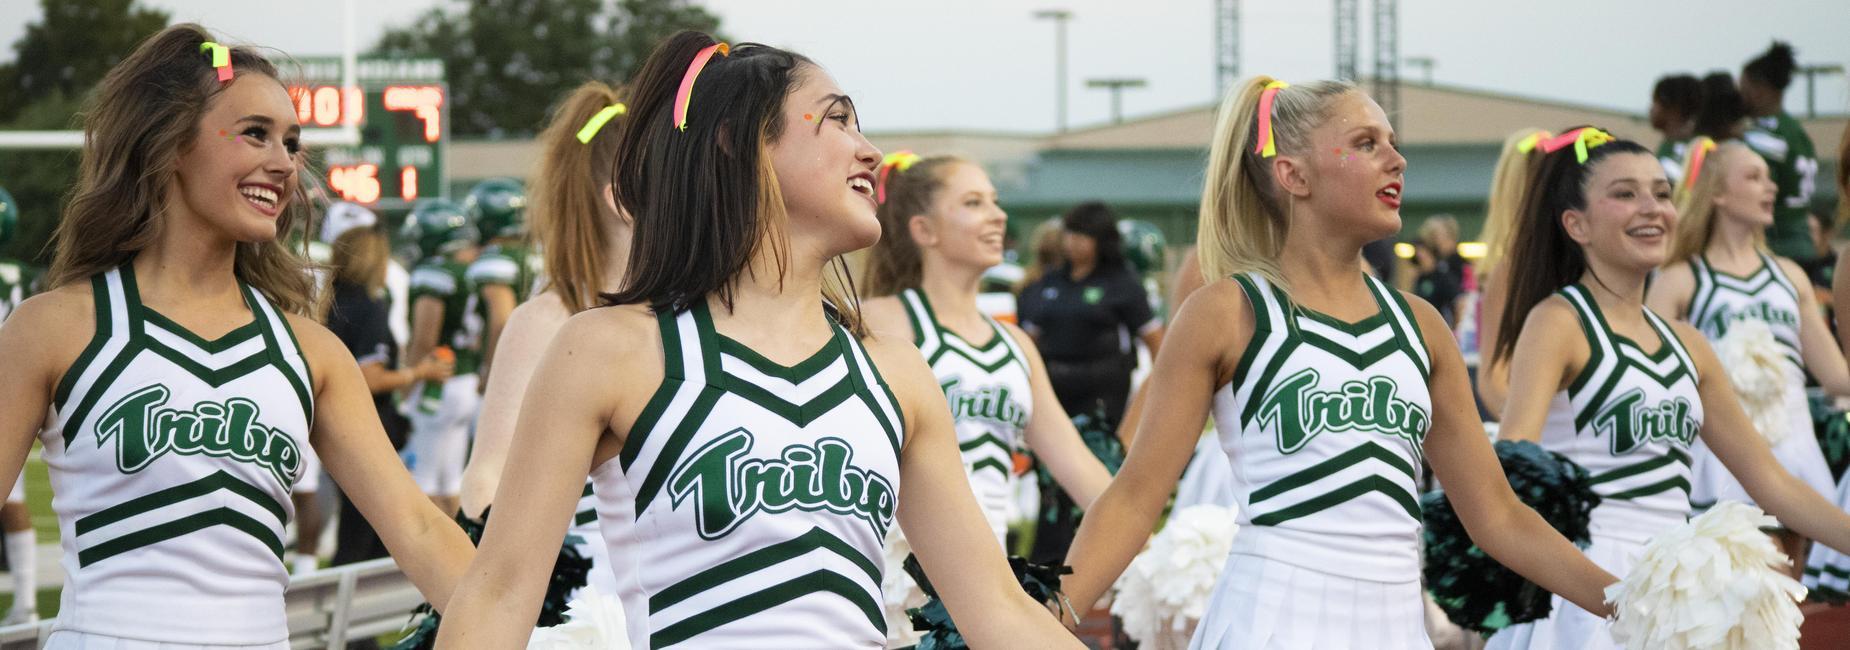 cheerleaders in uniform cheering during the game